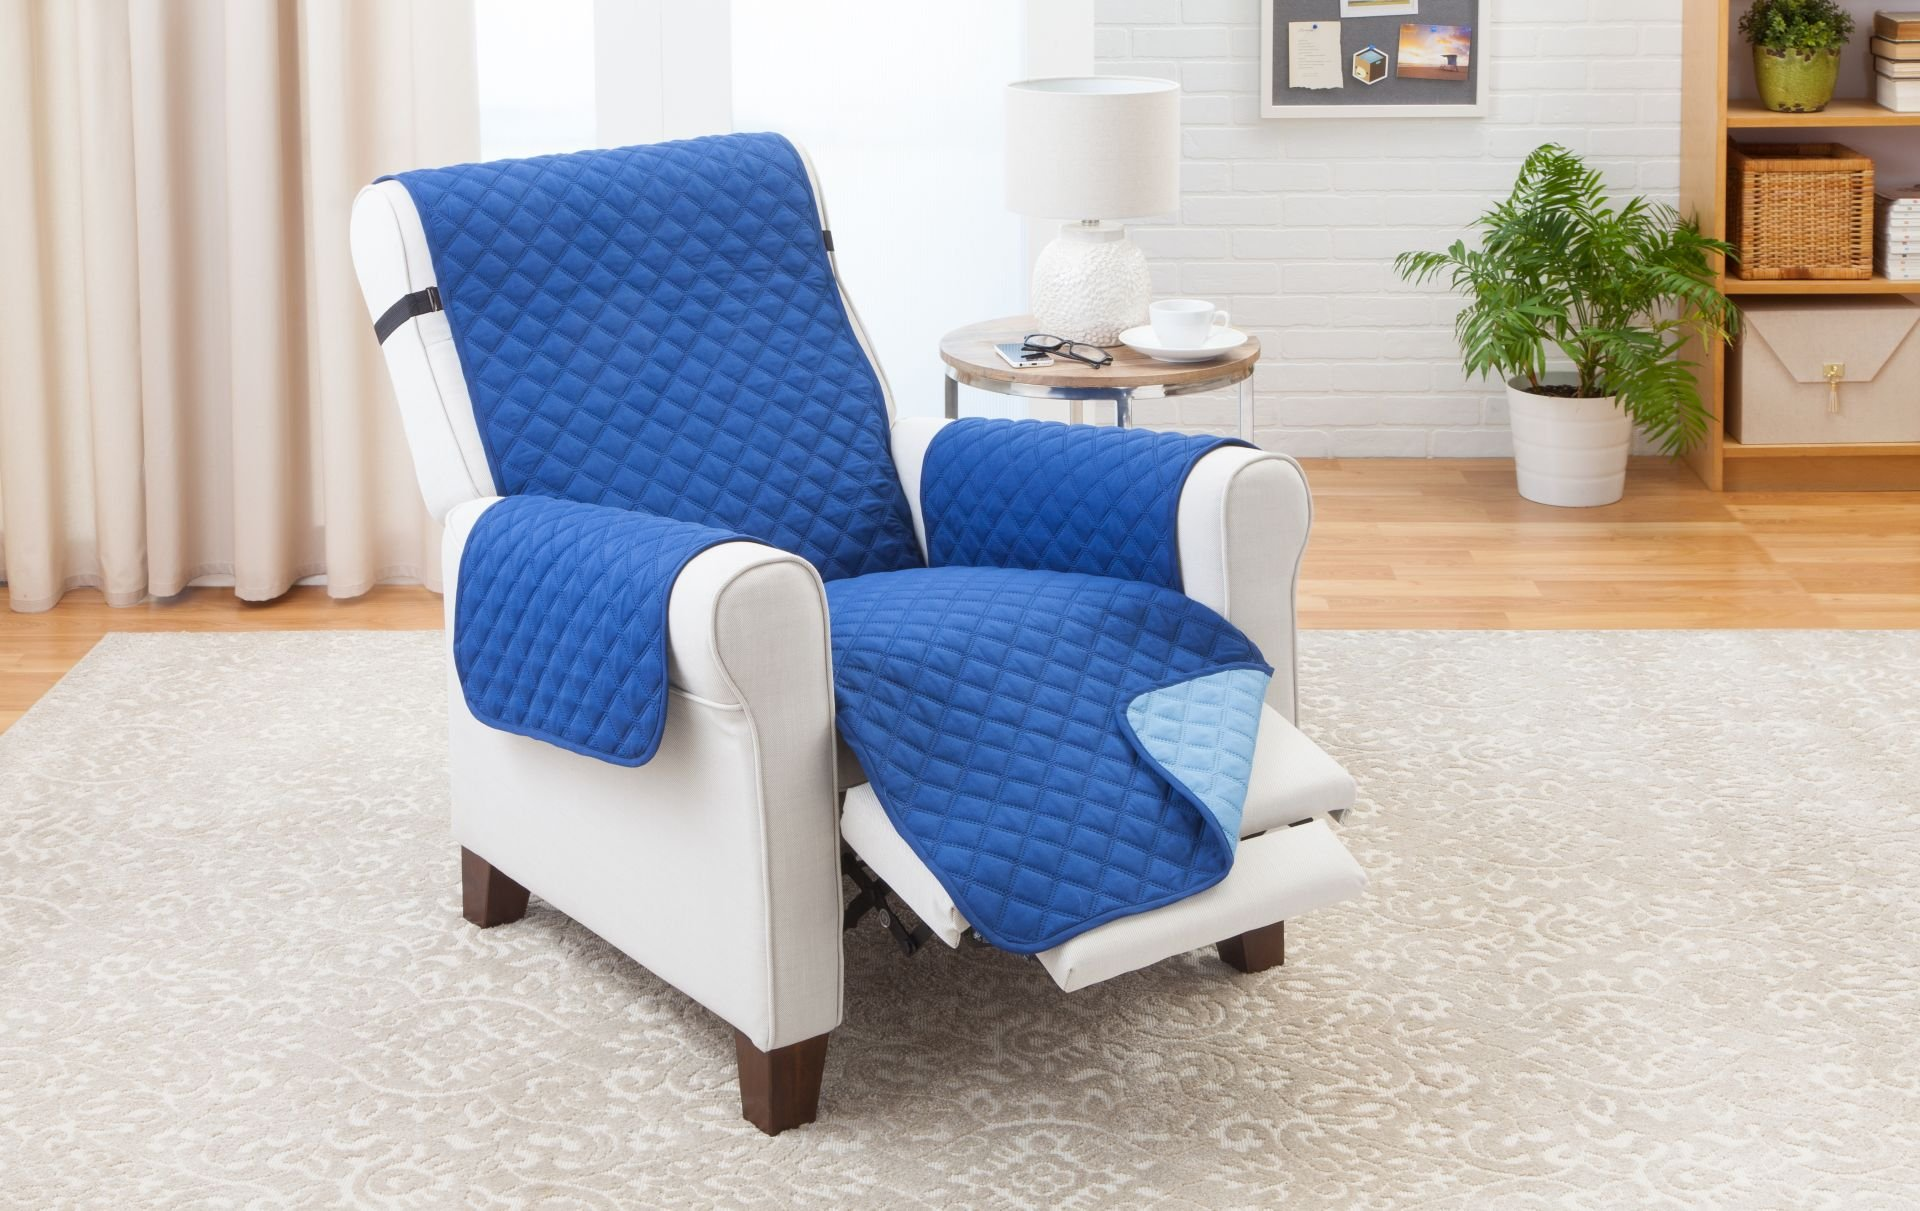 Deluxe Reversible RECLINER Furniture Protector, Blue / Light Blue 80''x 70'' by Elaine Karen